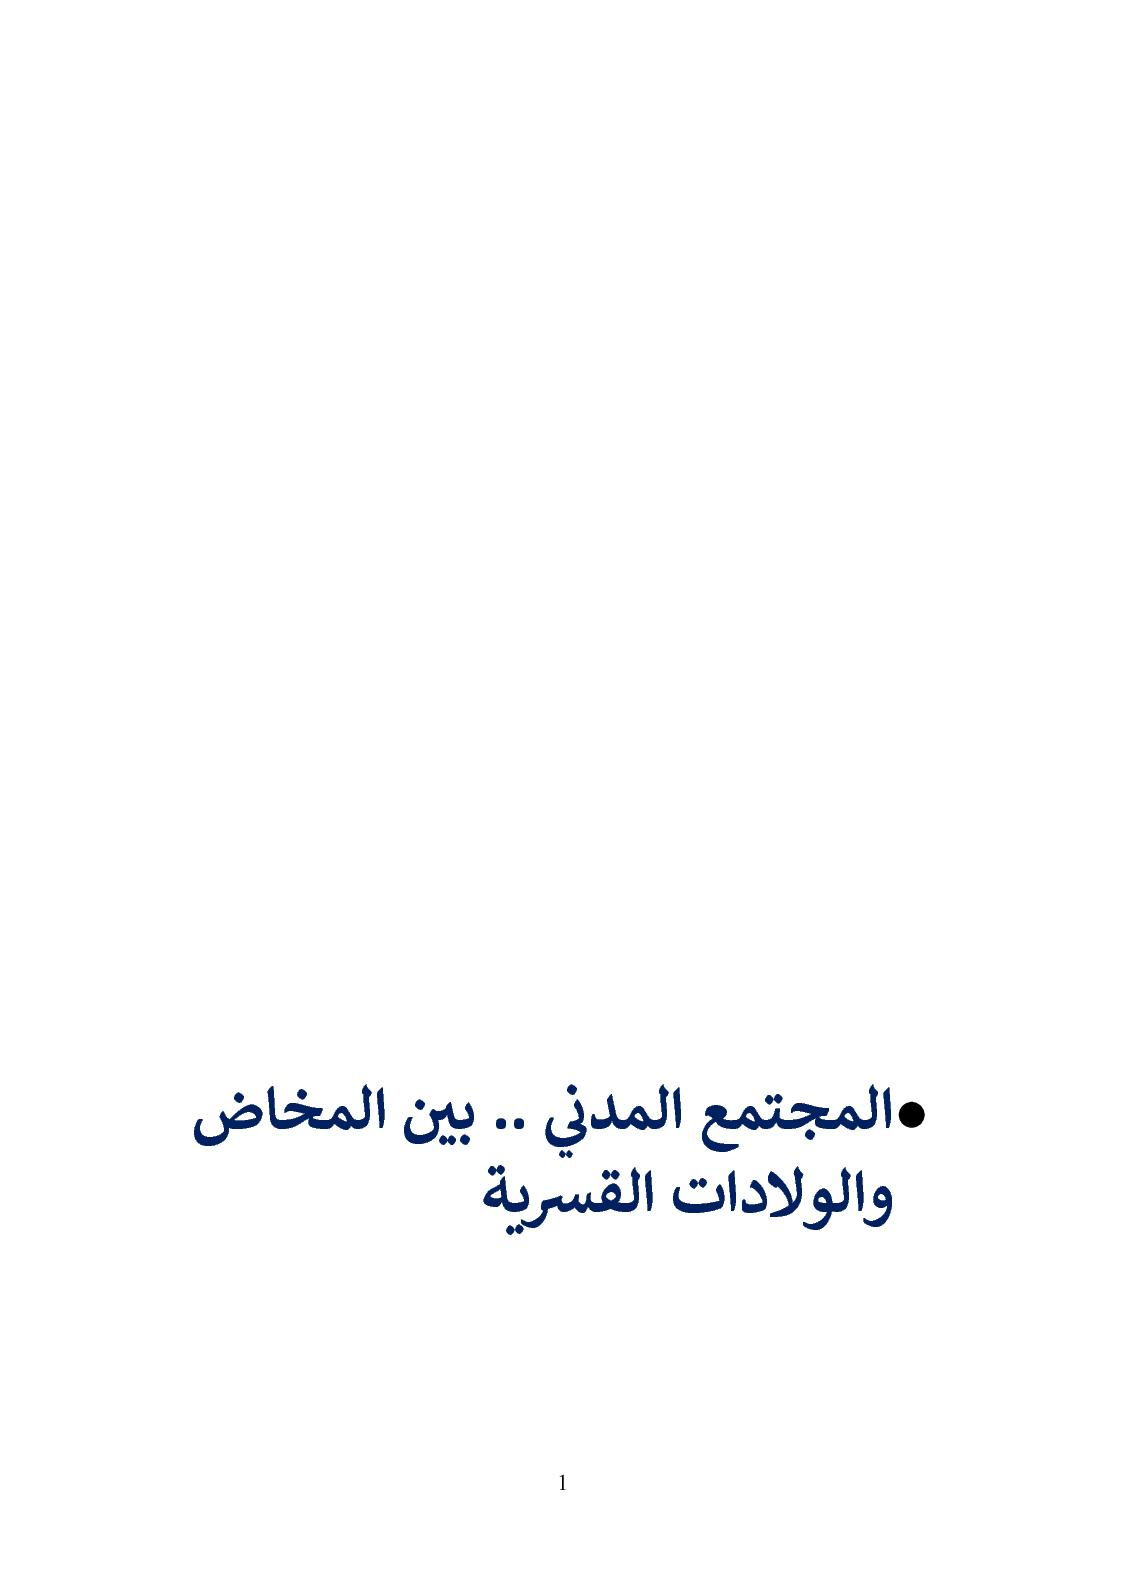 Calameo المجتمع المدني بين المخاض والولادات القسرية بير رستم